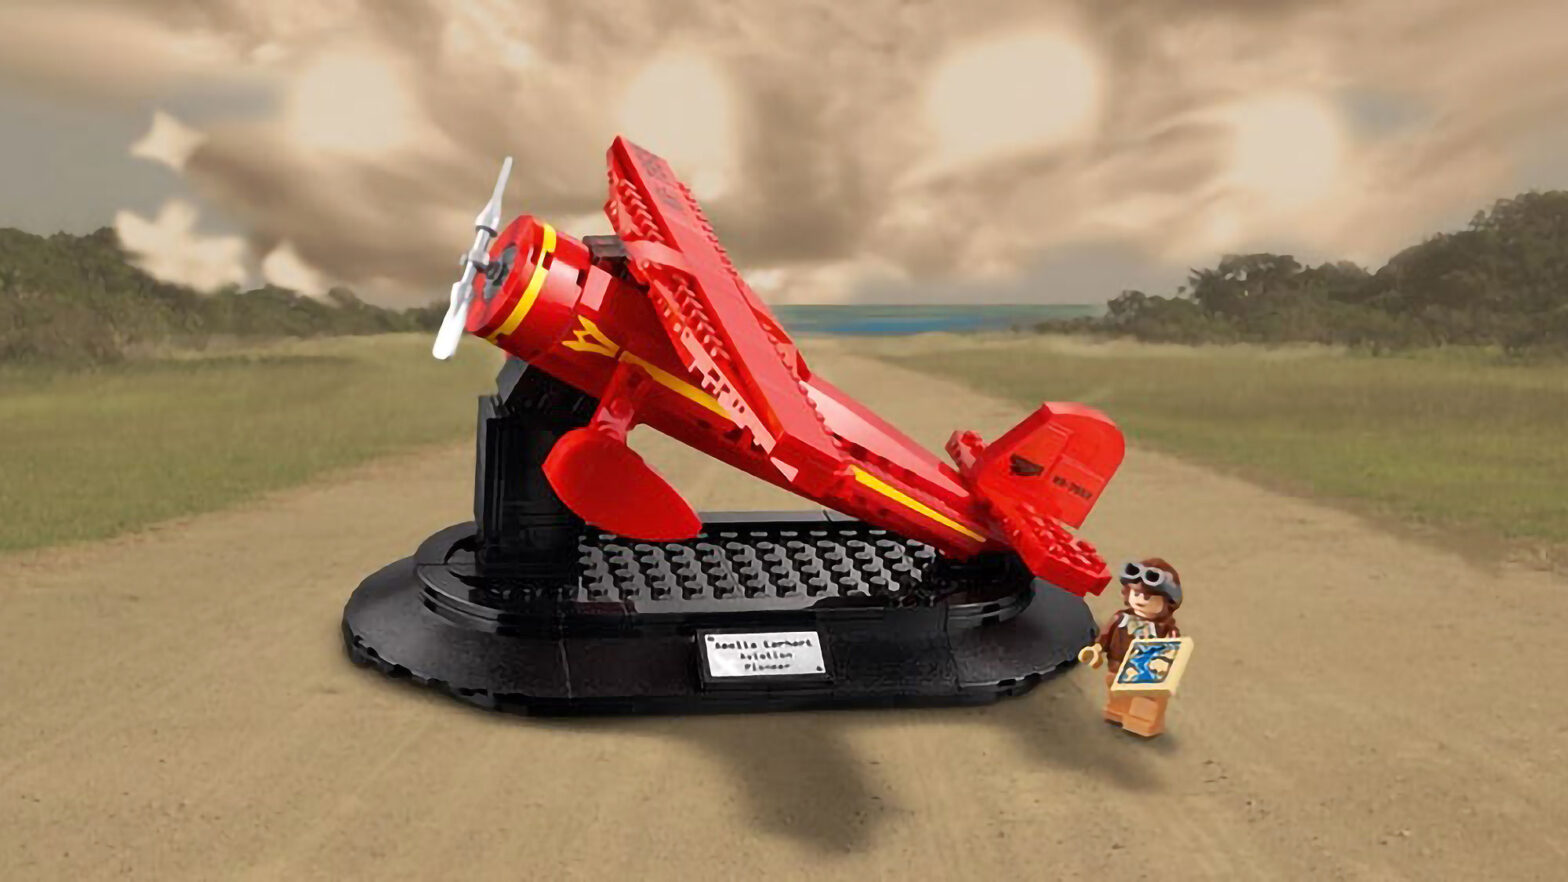 LEGO 40450 Amelia Earhart Tribute Set Free